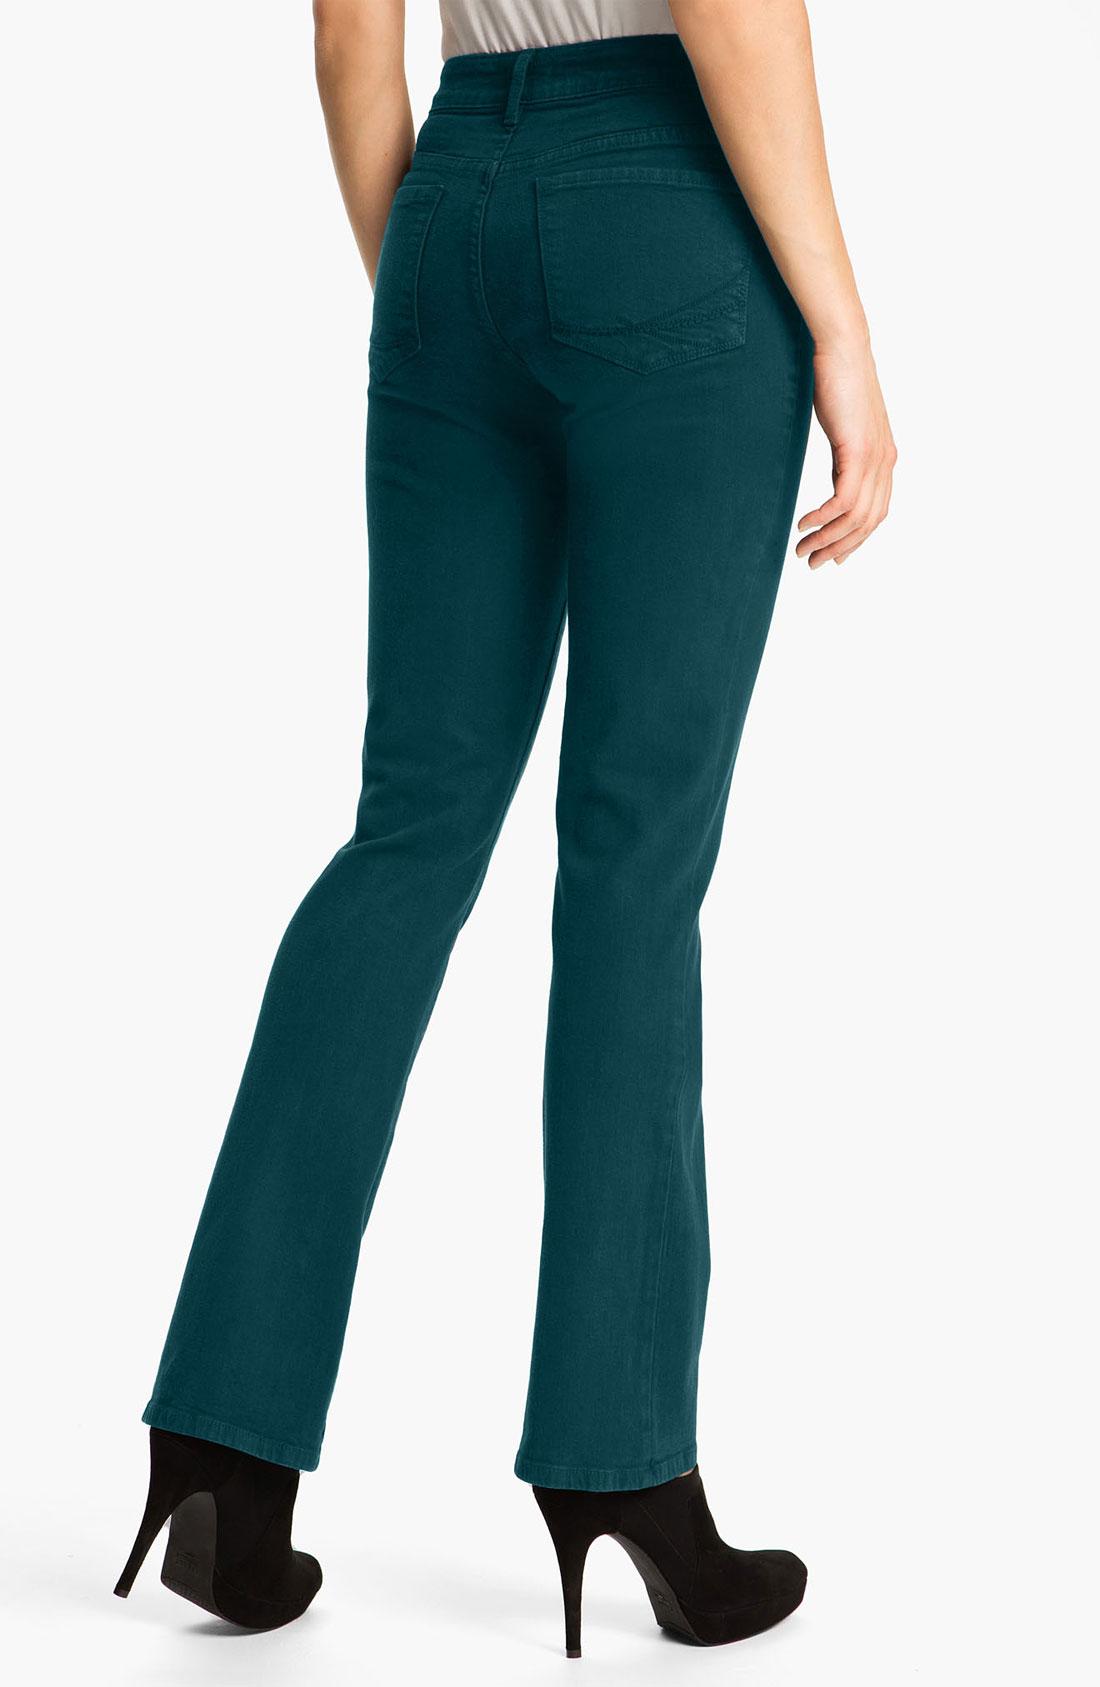 Tin haul dolly celebrity jeans size